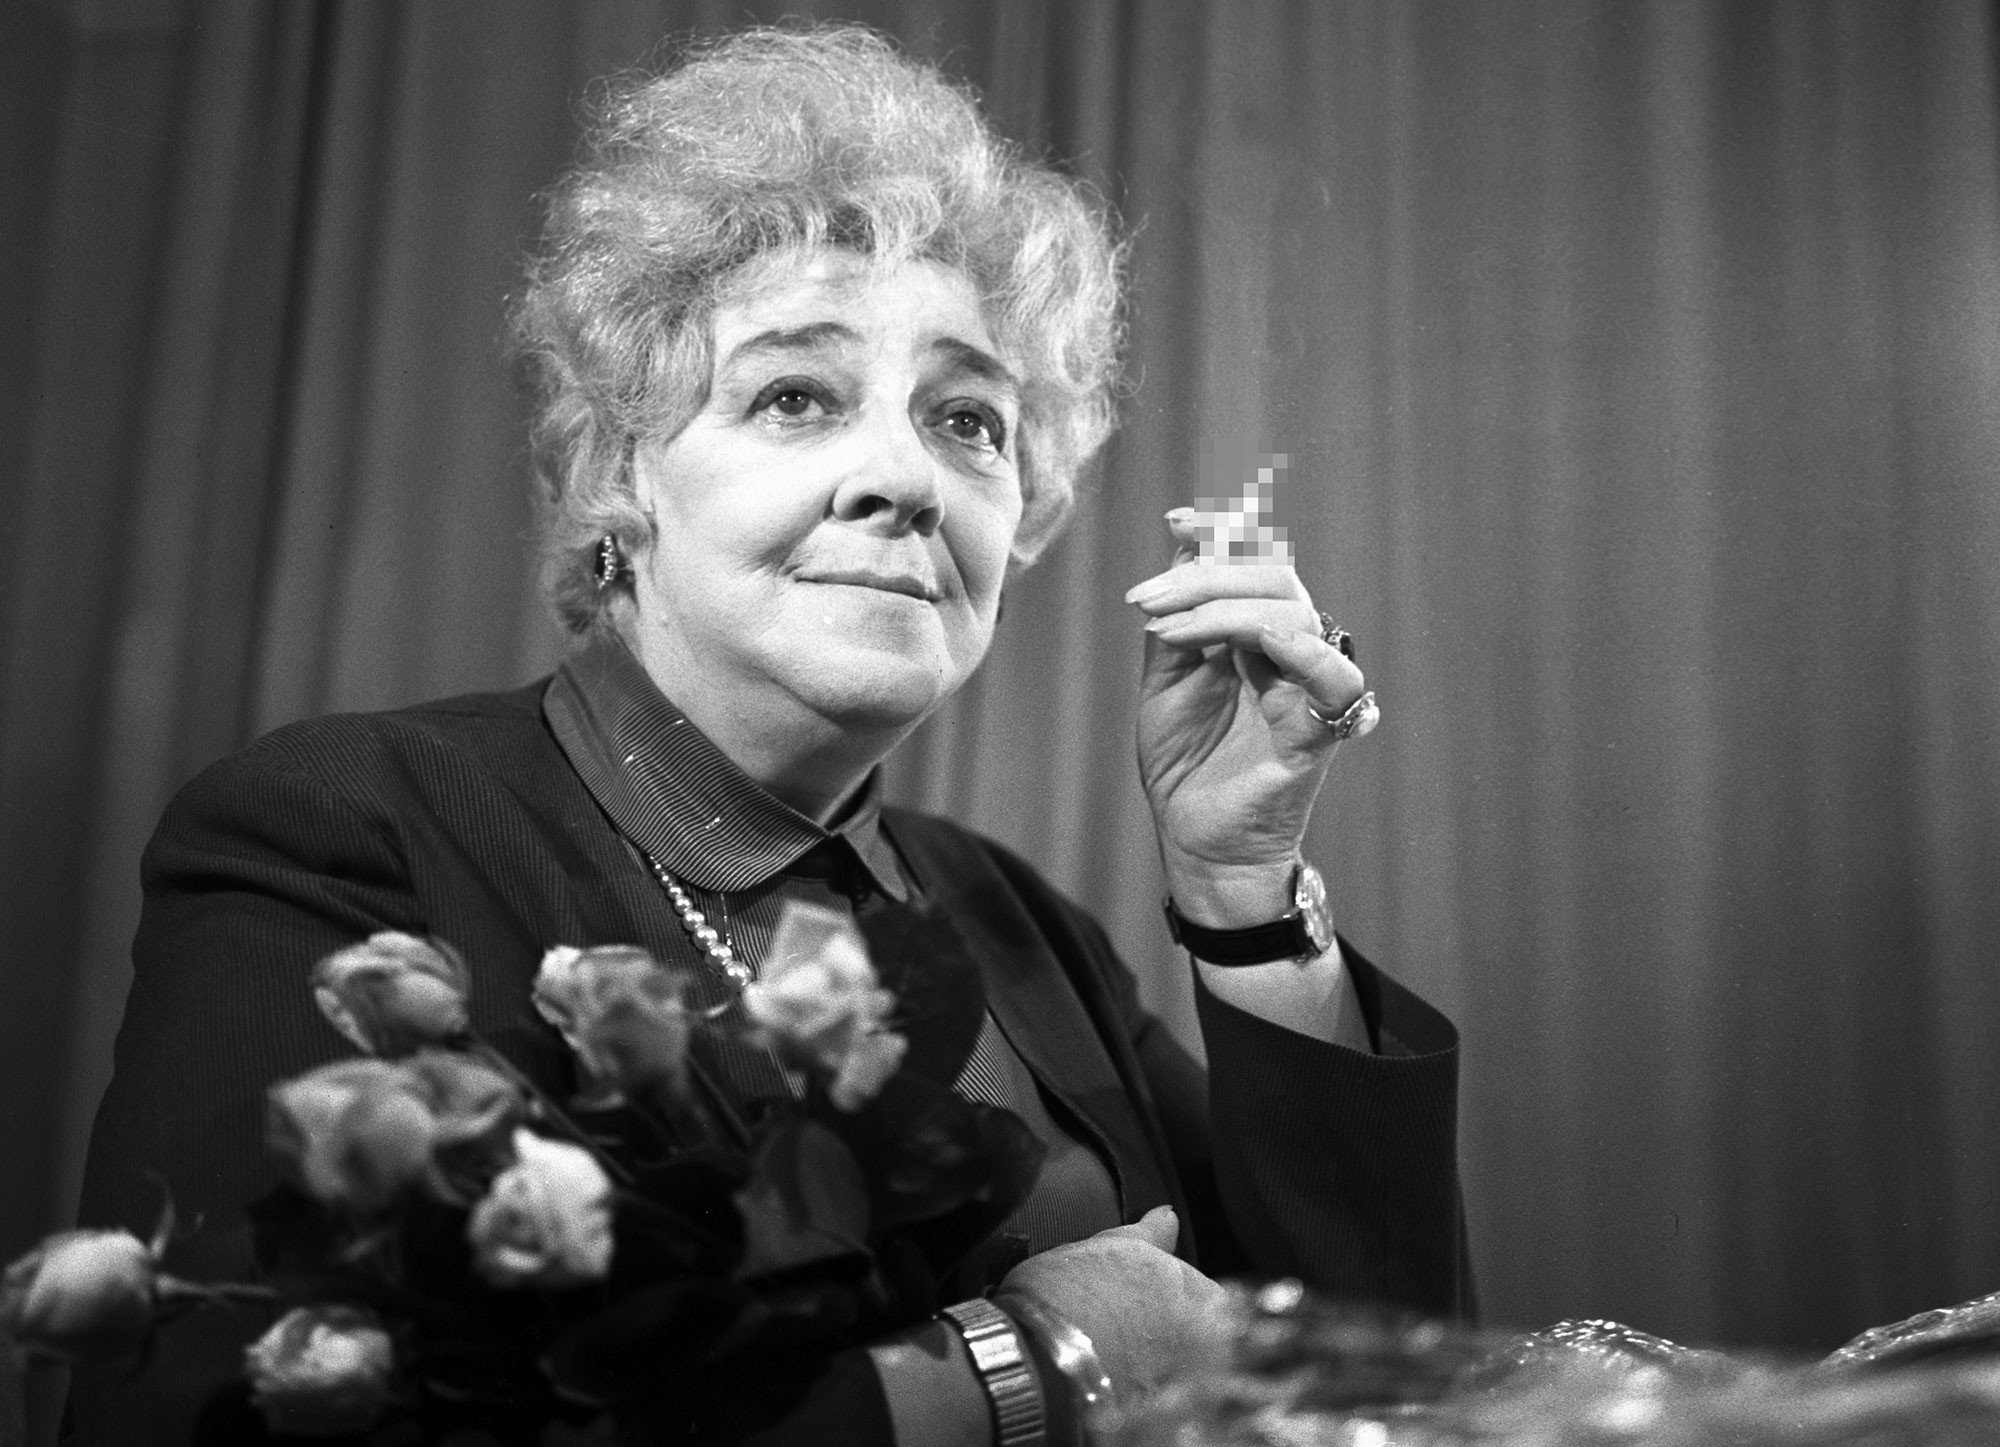 Народная артистка СССР, актриса театра им. Моссовета Фаина Раневская (1896–1984). Фото: ©РИА Новости / Юрий Сомов